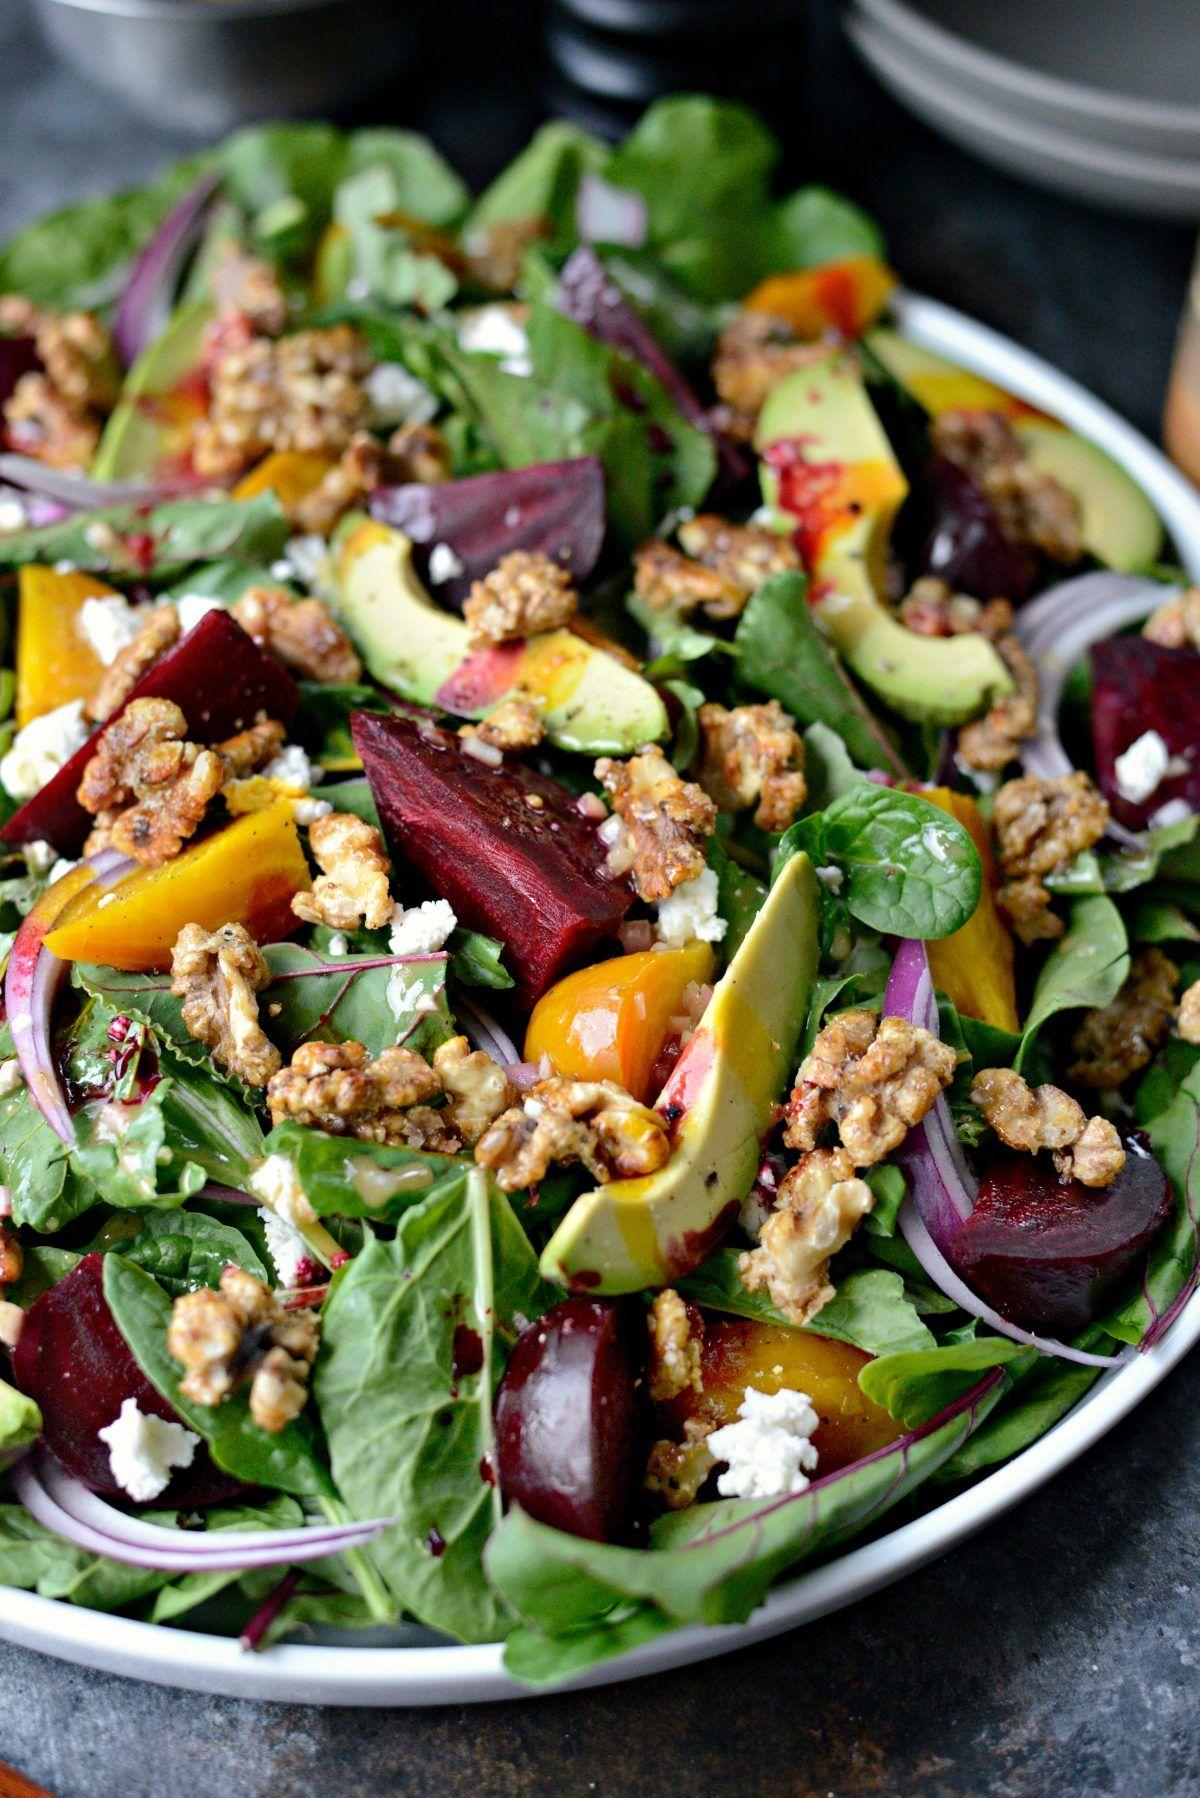 Roasted Beet Salad with Honey Dijon Vinaigrette -